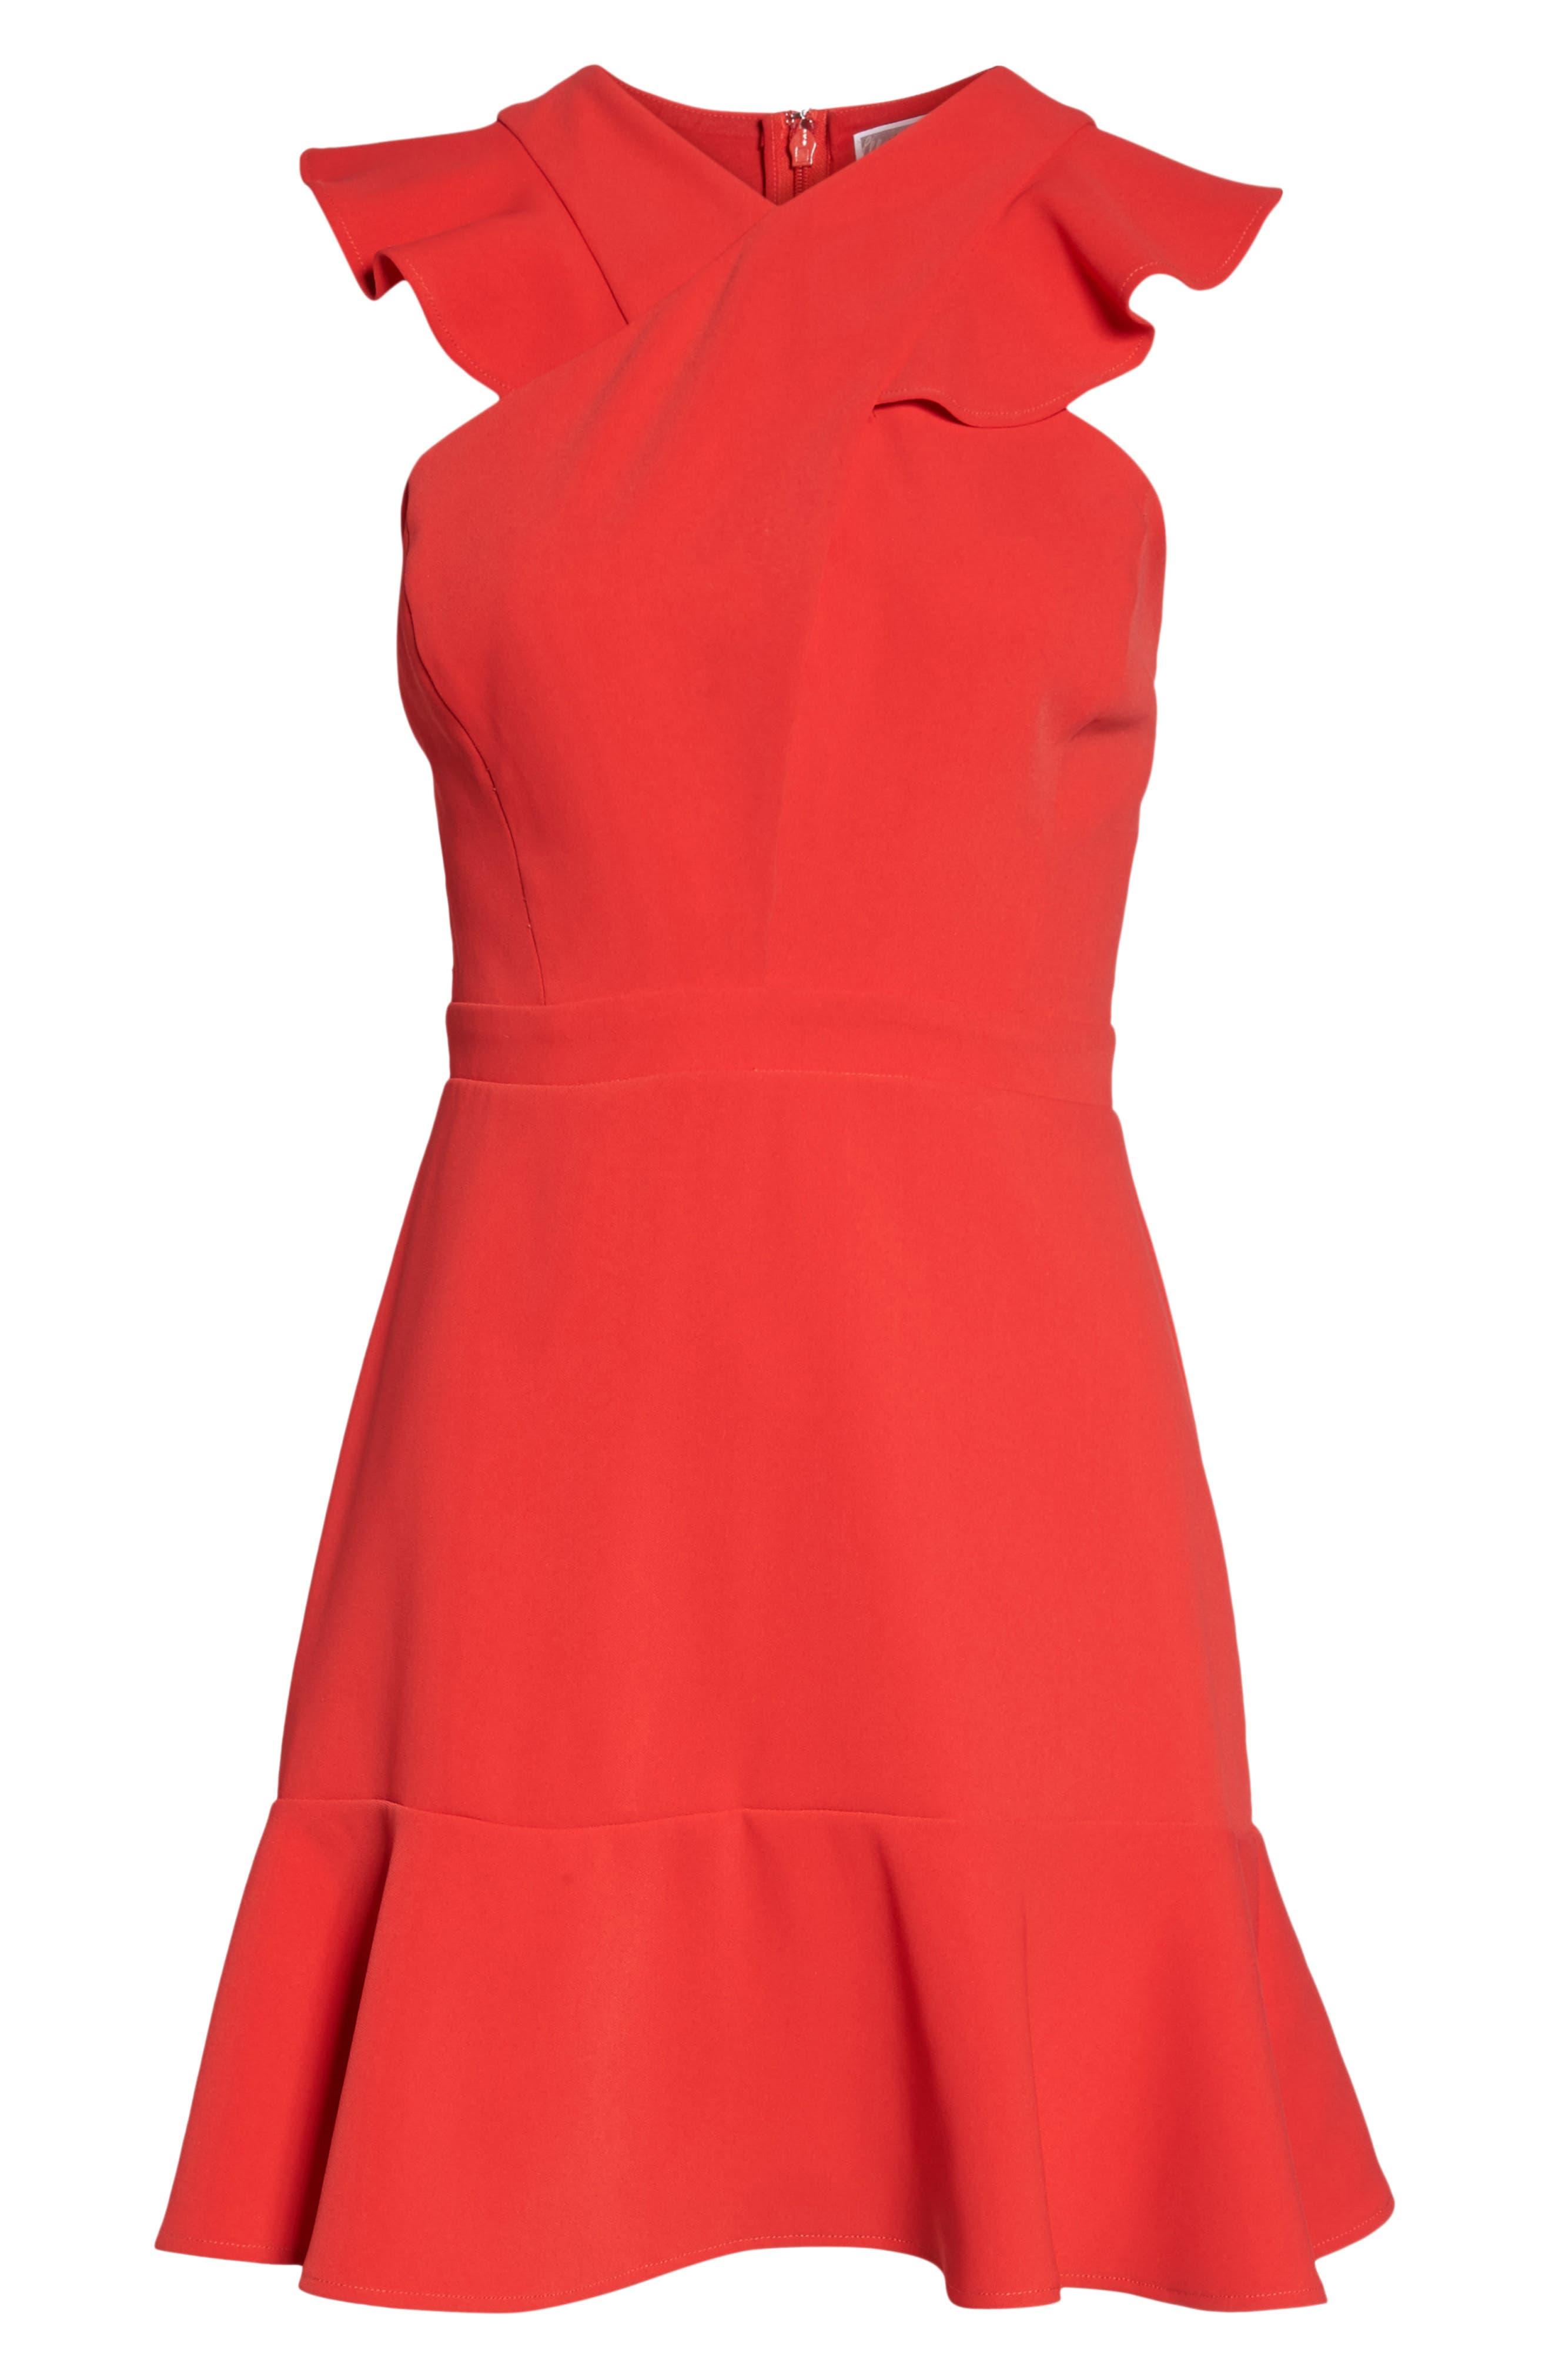 Cross Front Ruffle Dress,                             Alternate thumbnail 4, color,                             Red Mars